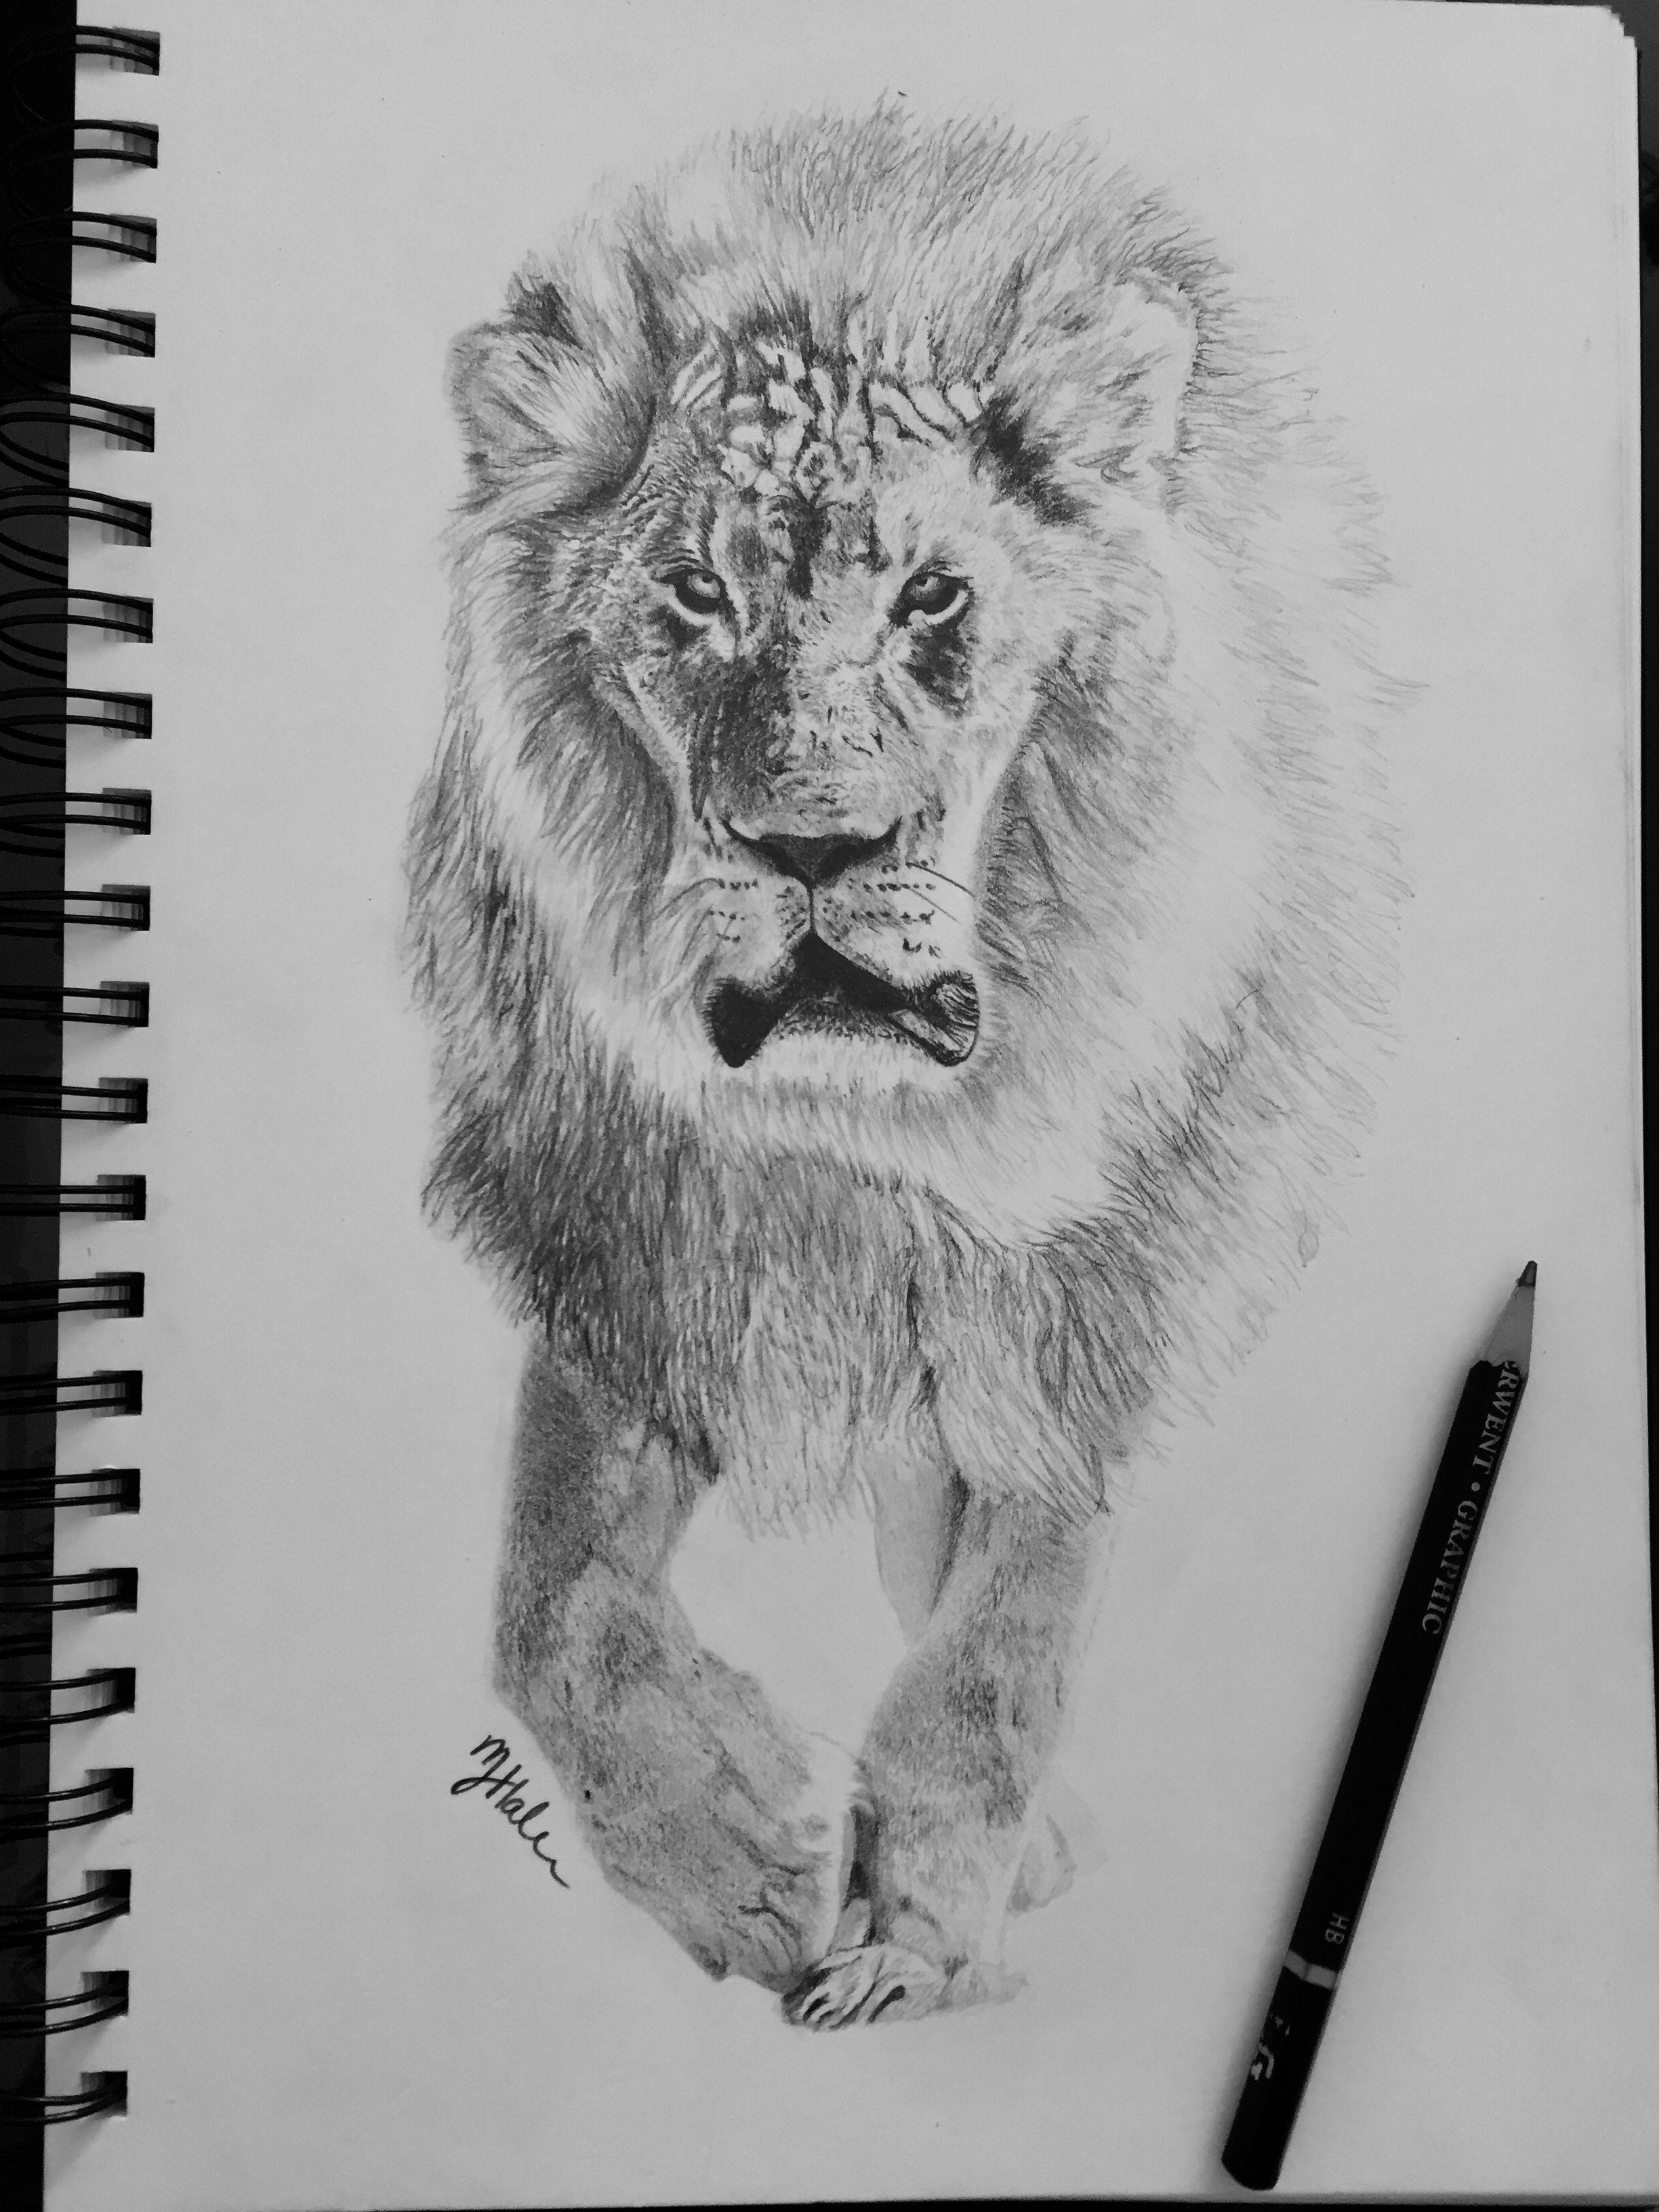 Lion walking sketch Black and white Pencil drawing